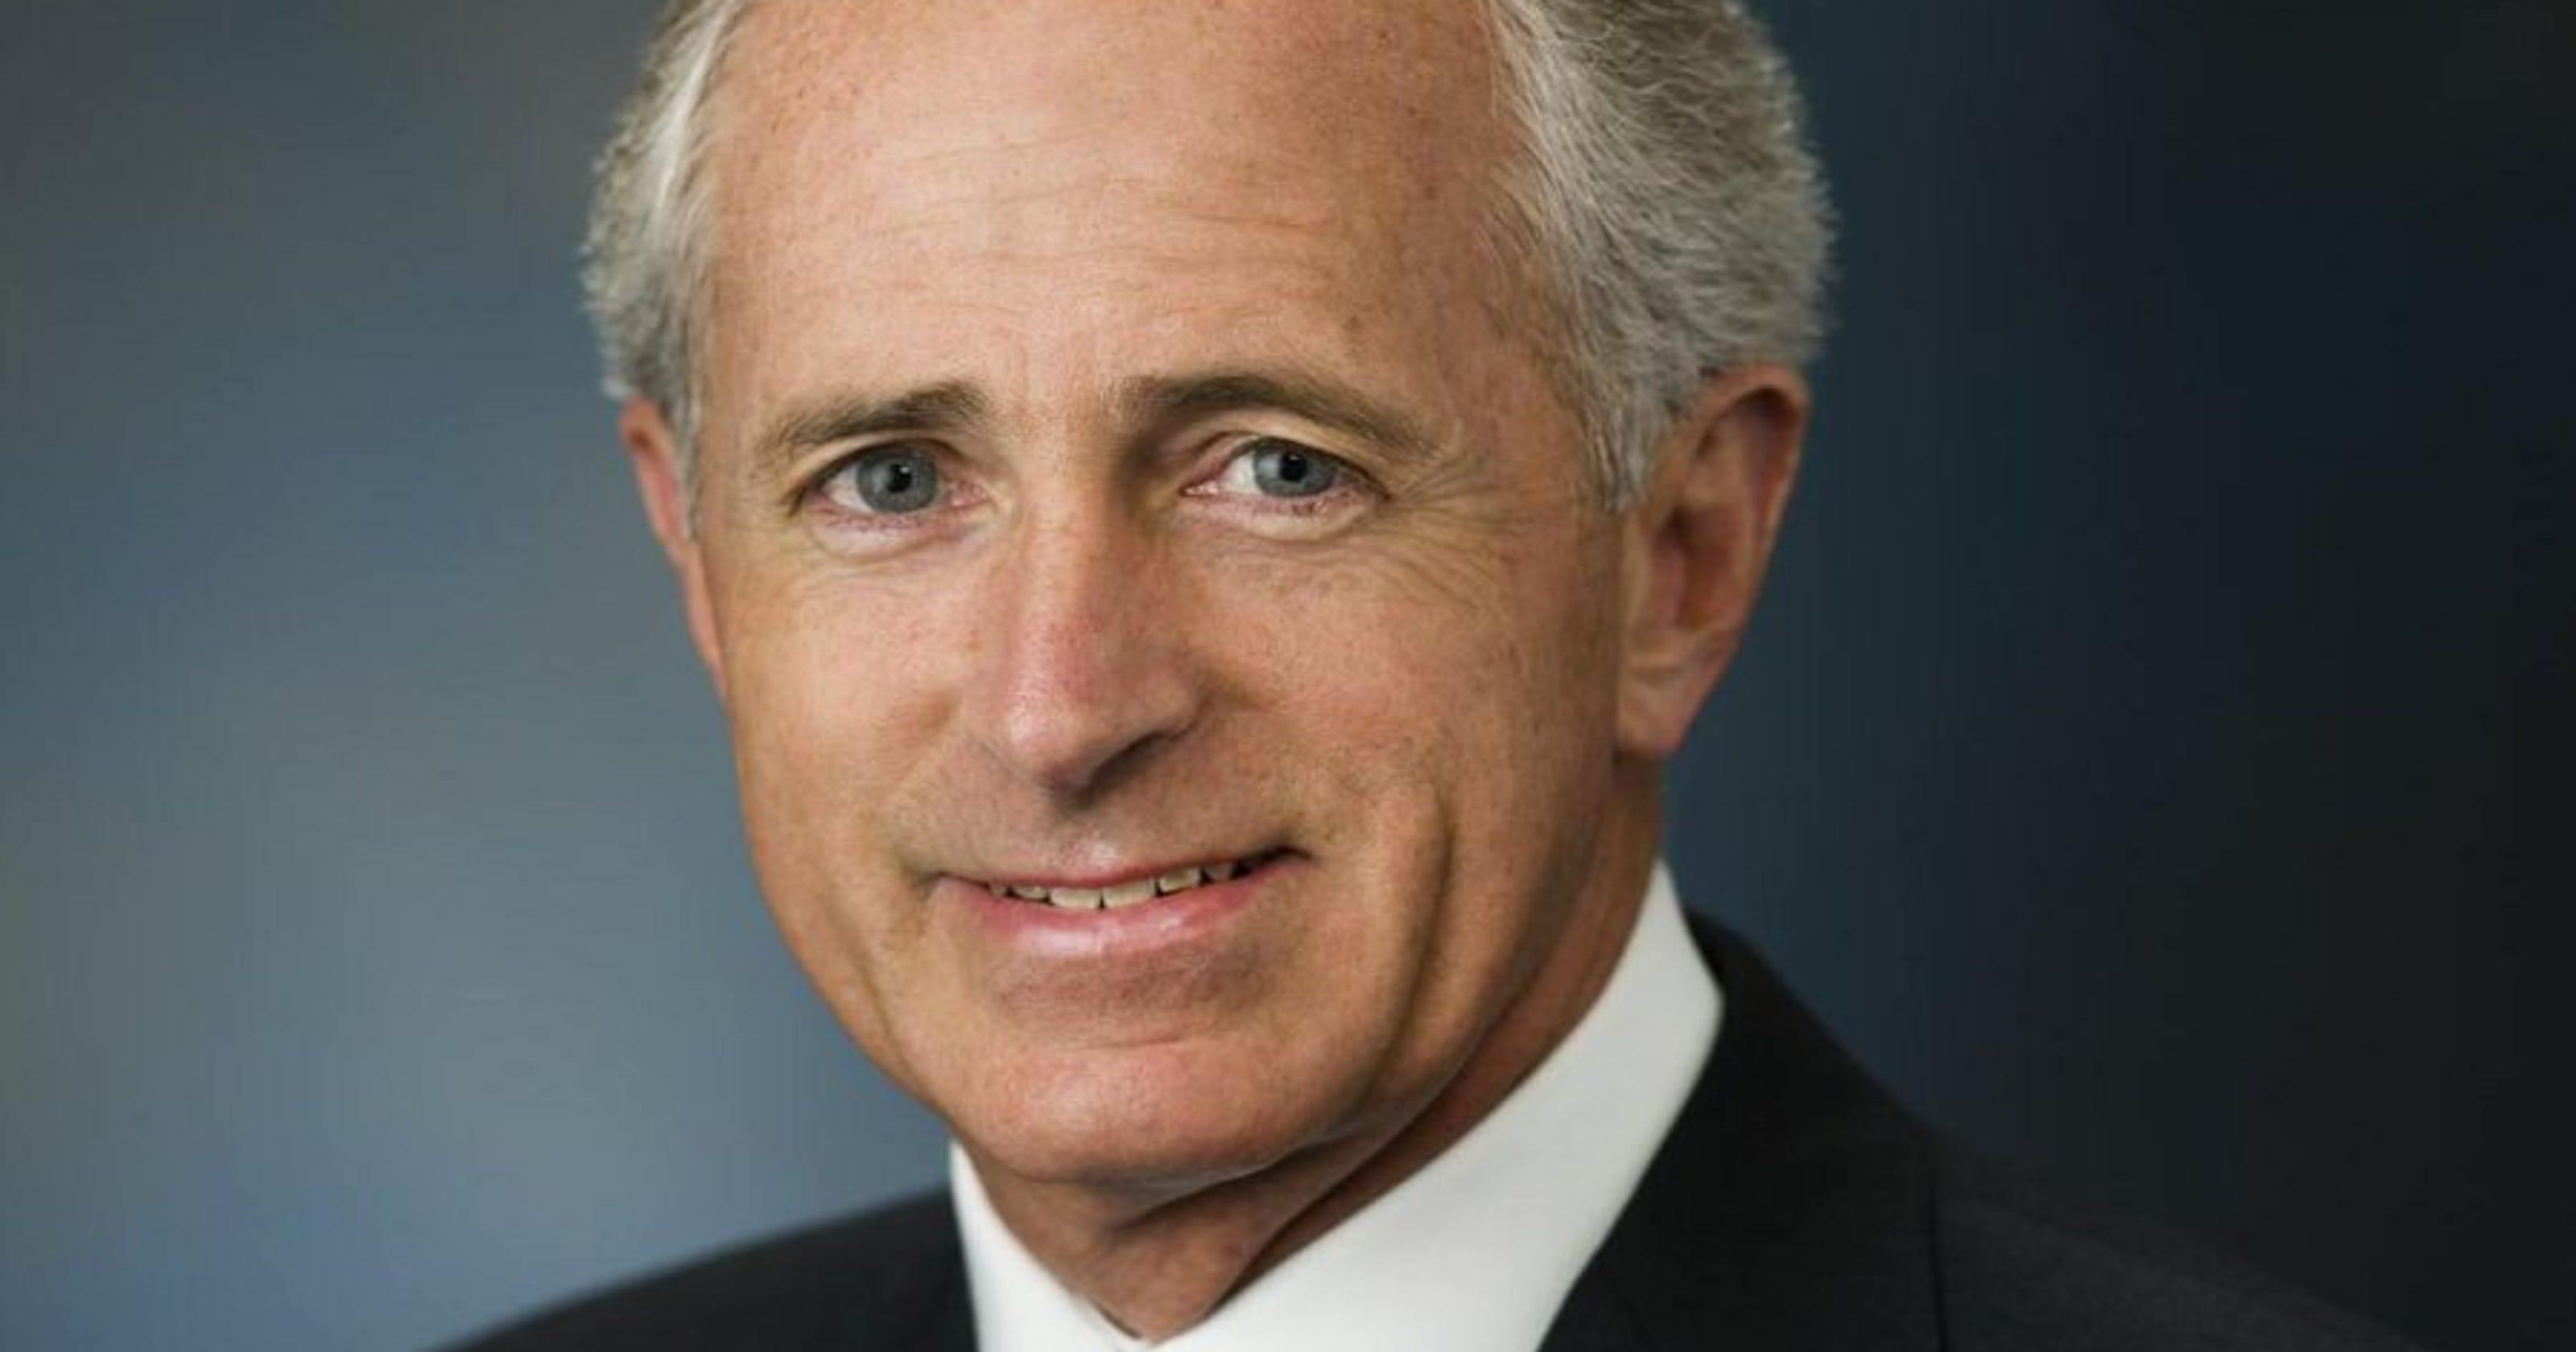 Running against Trump not practical, former TN Sen  Corker says